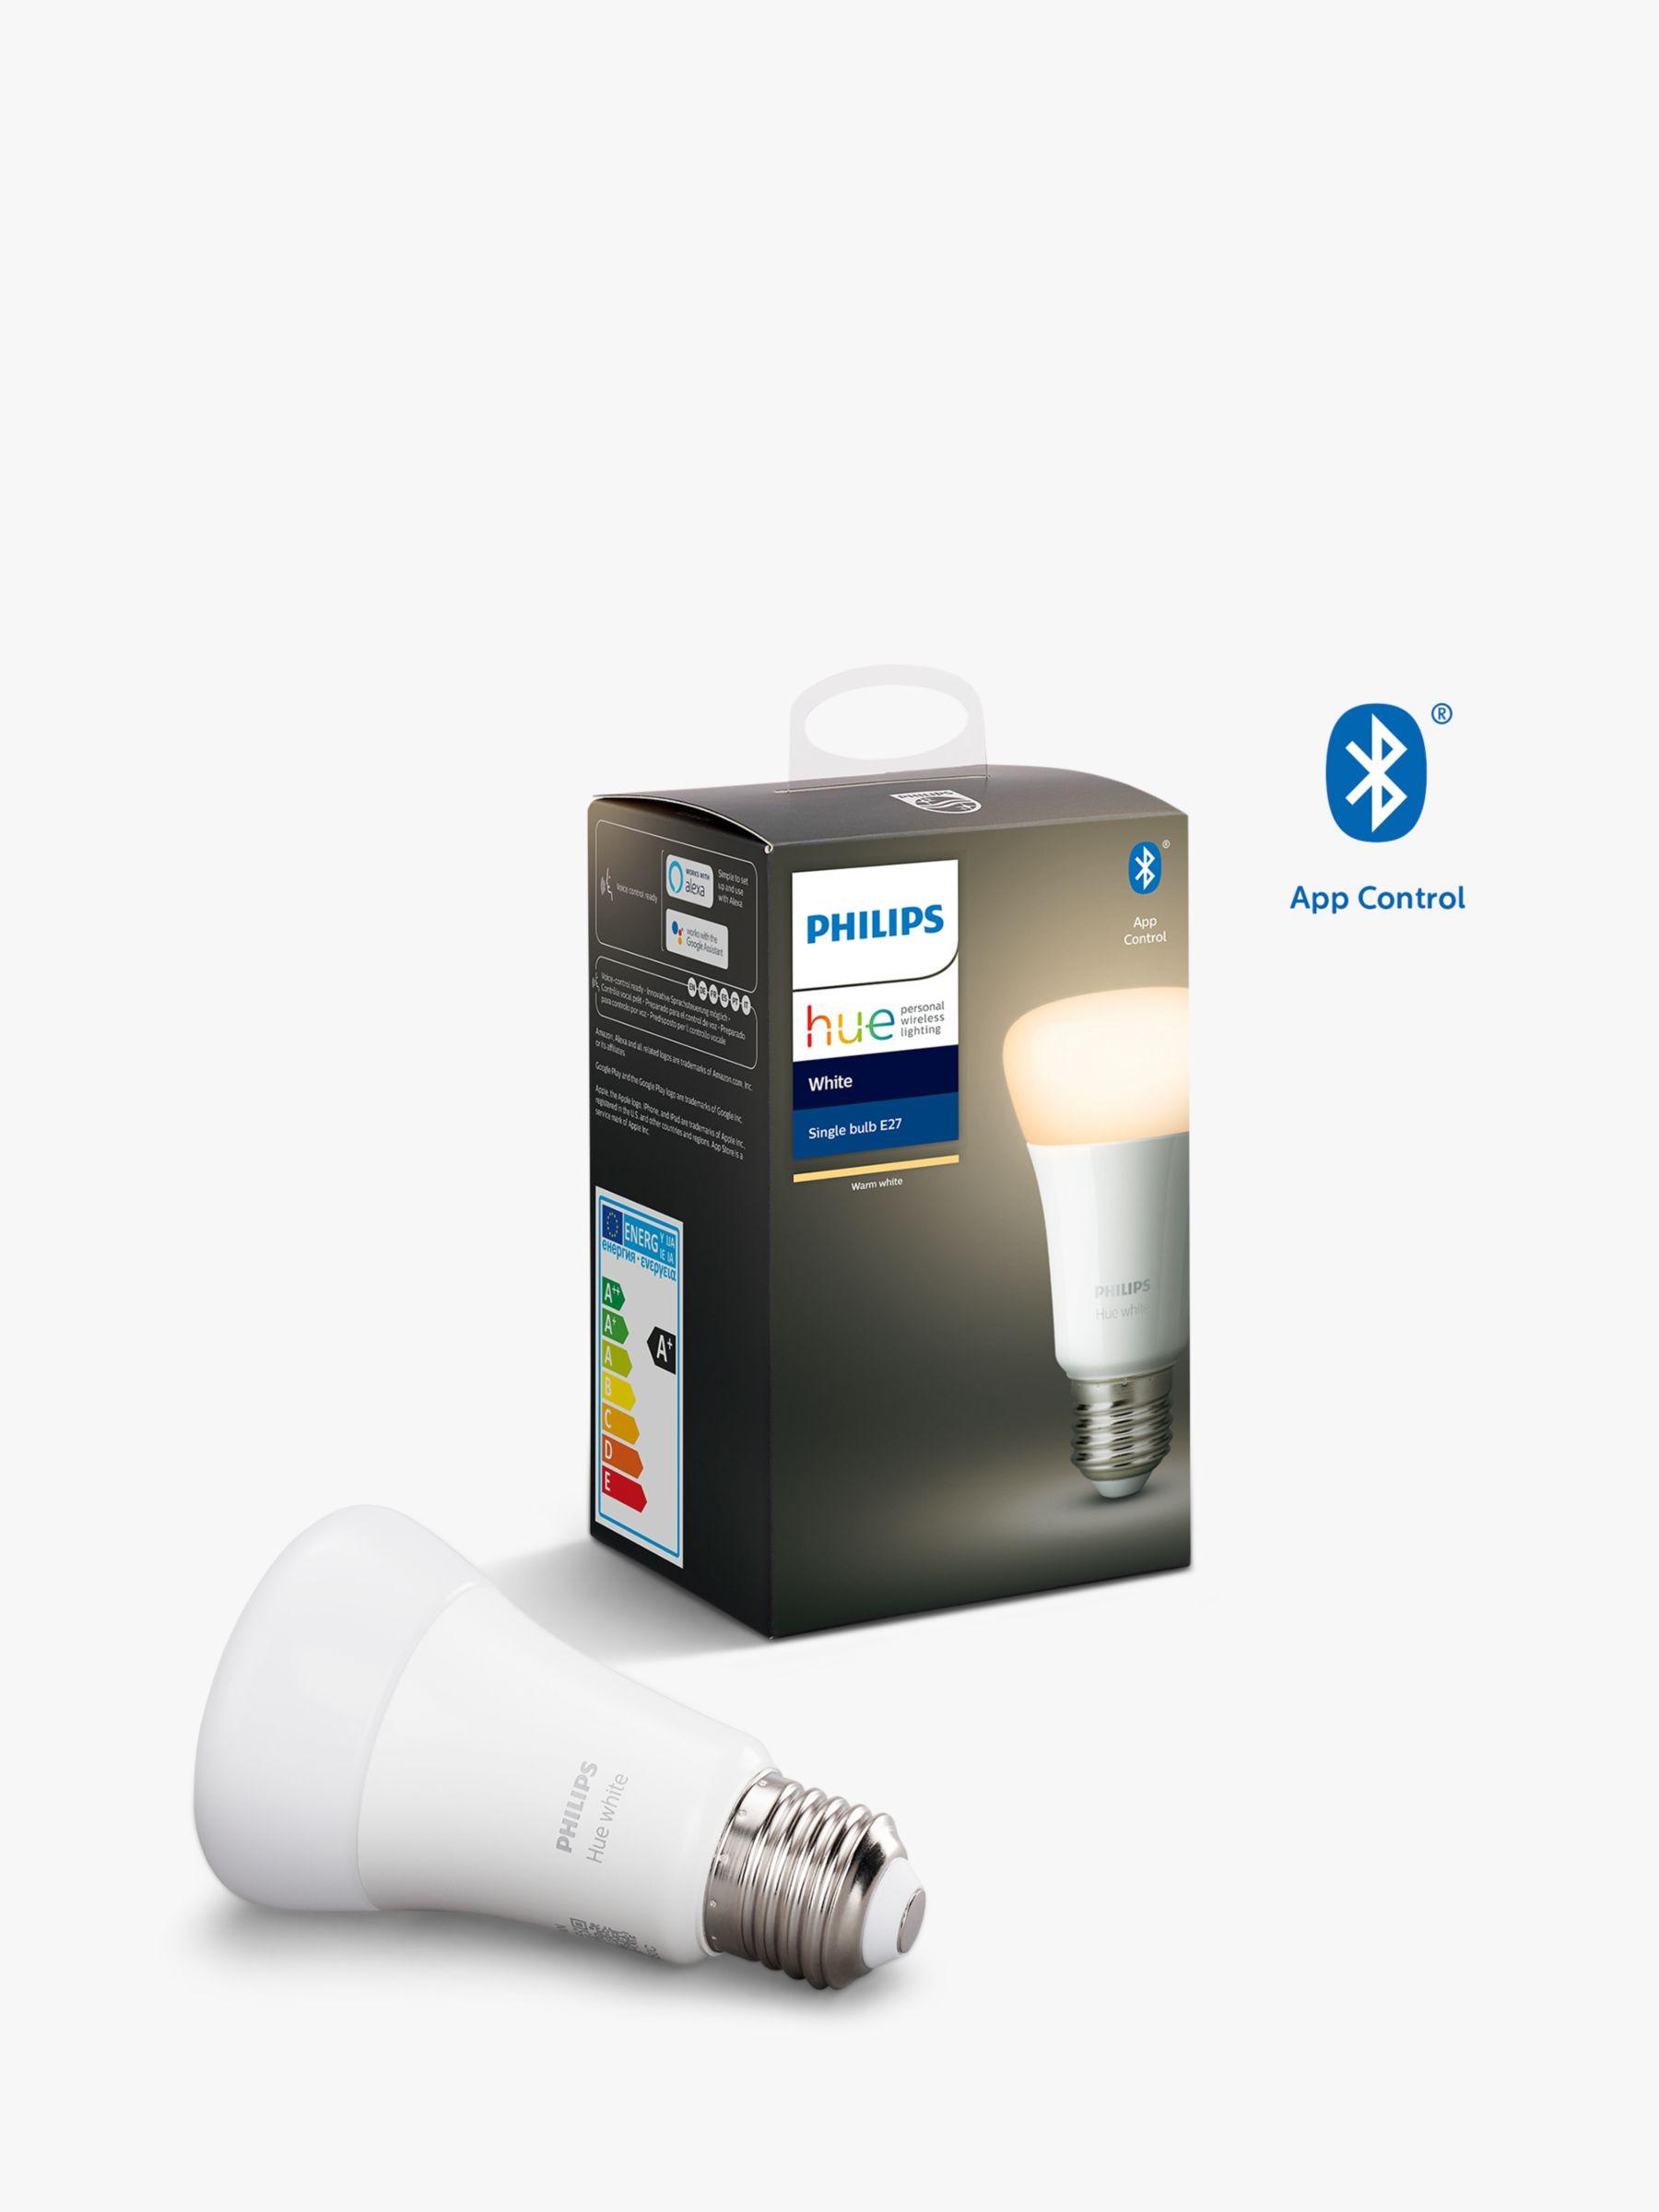 Philips Philips Hue White Wireless Lighting LED Light Bulb with Bluetooth, 9W A60 E27 Edison Screw Cap Bulb, Single